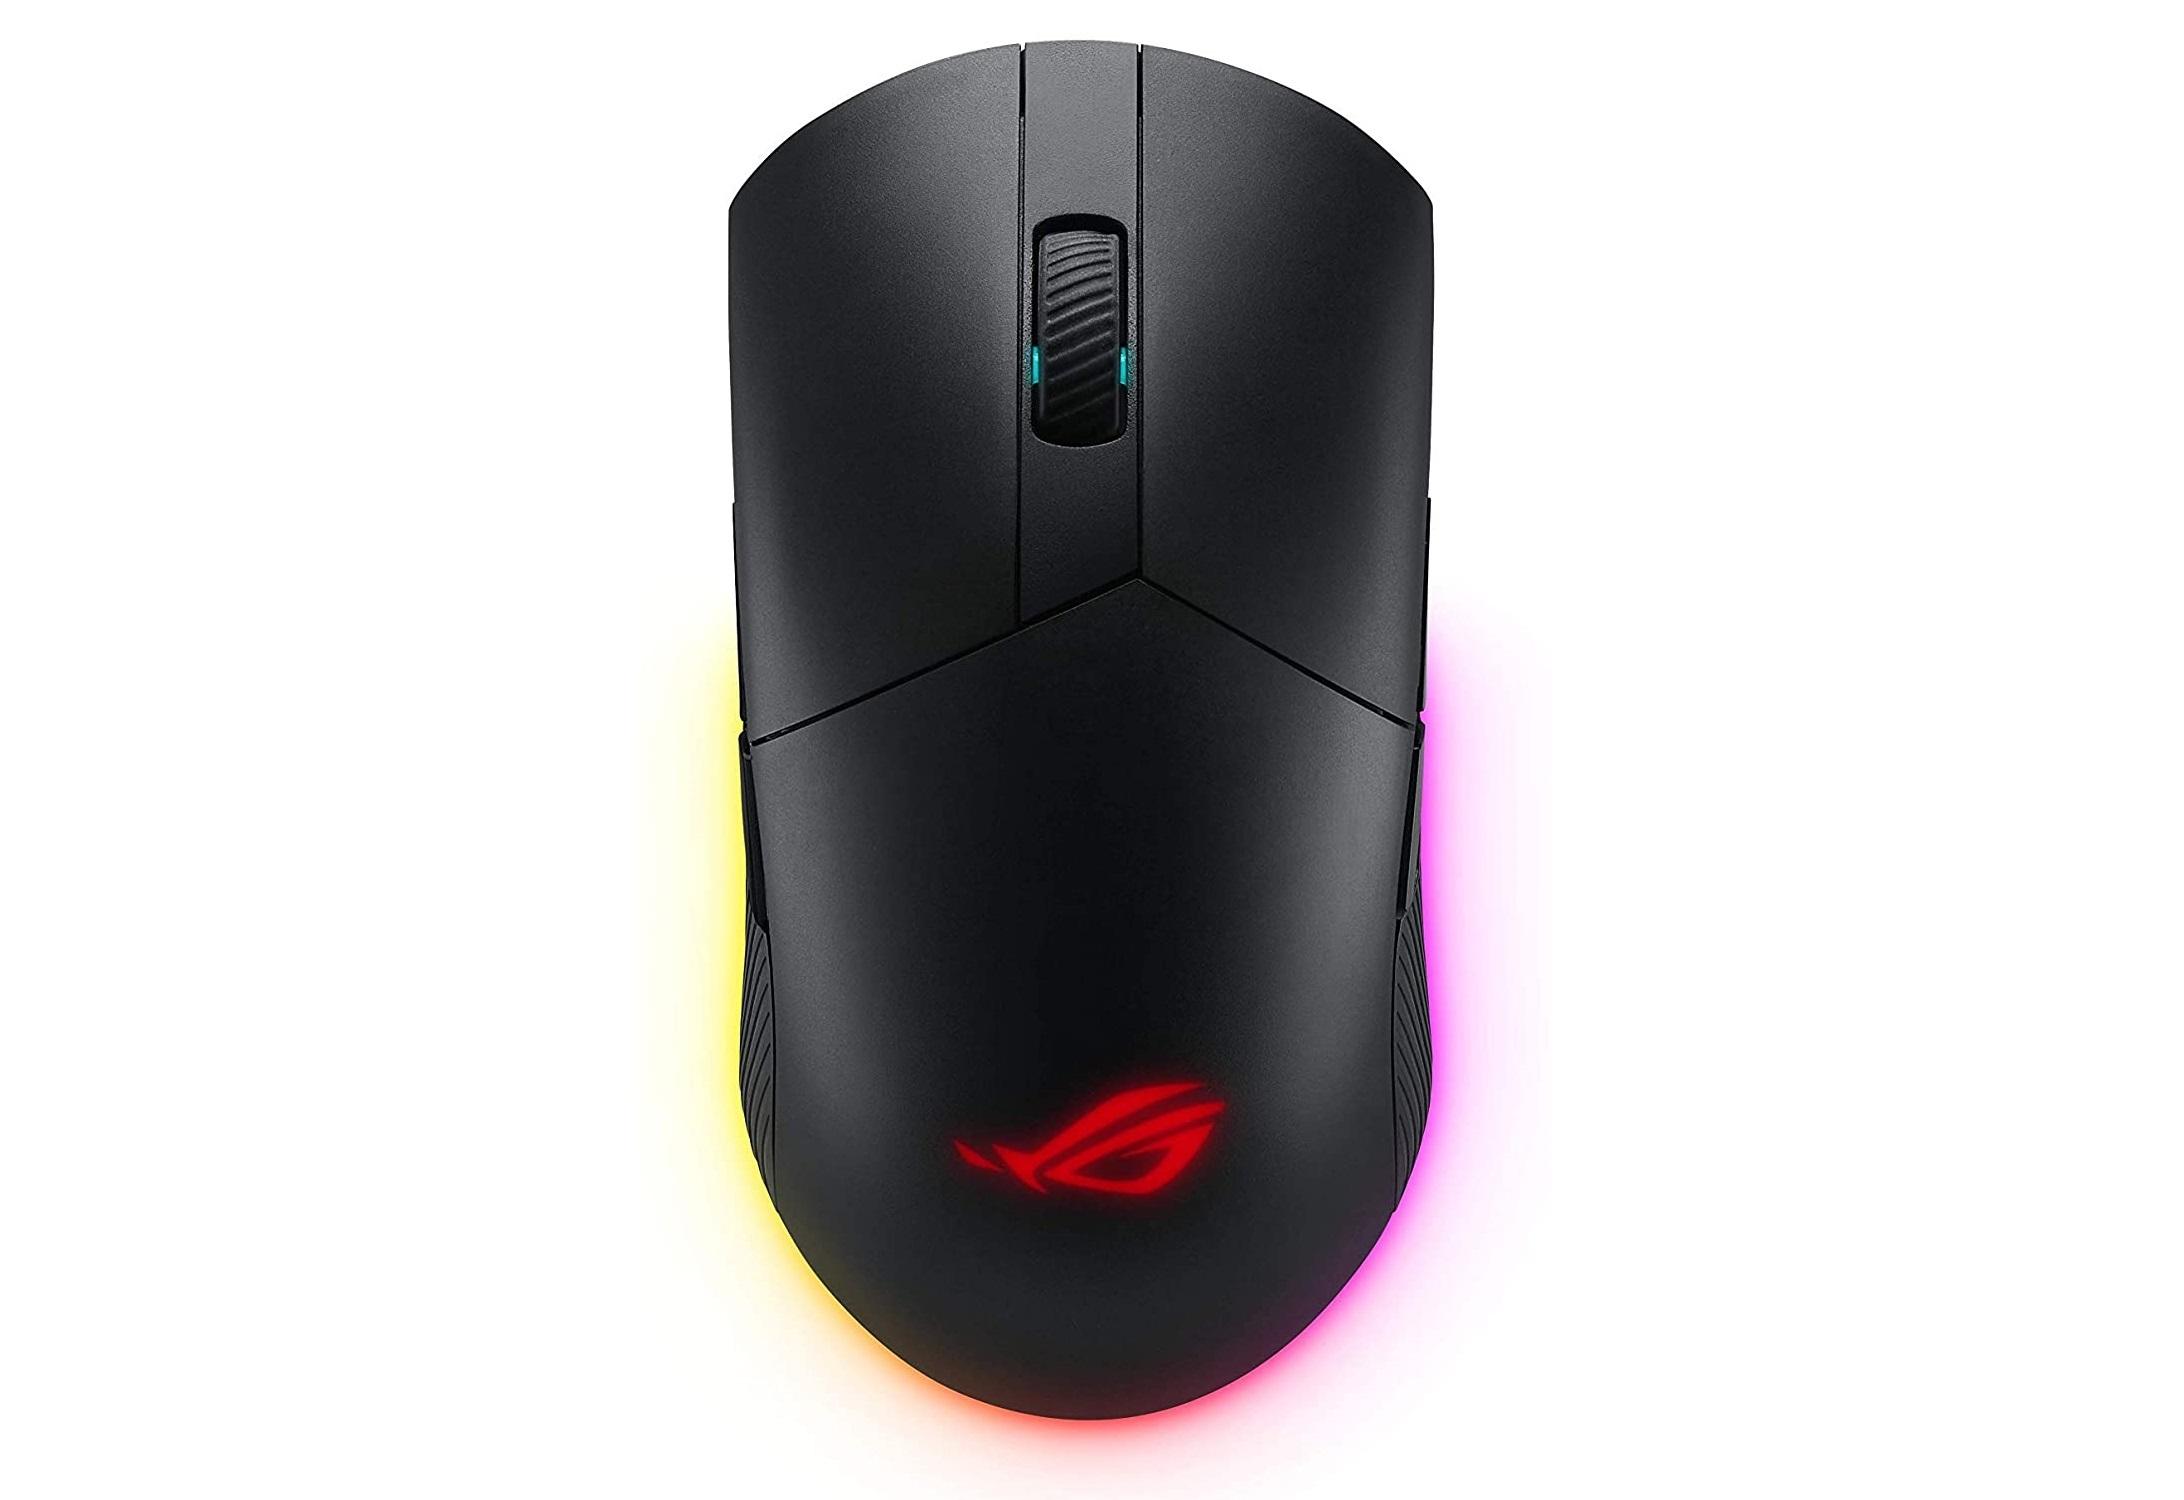 ASUS、簡単にスイッチ換装が可能な無線ゲーミングマウス「ASUS ROG Pugio II」を9月4日(金)に国内発売